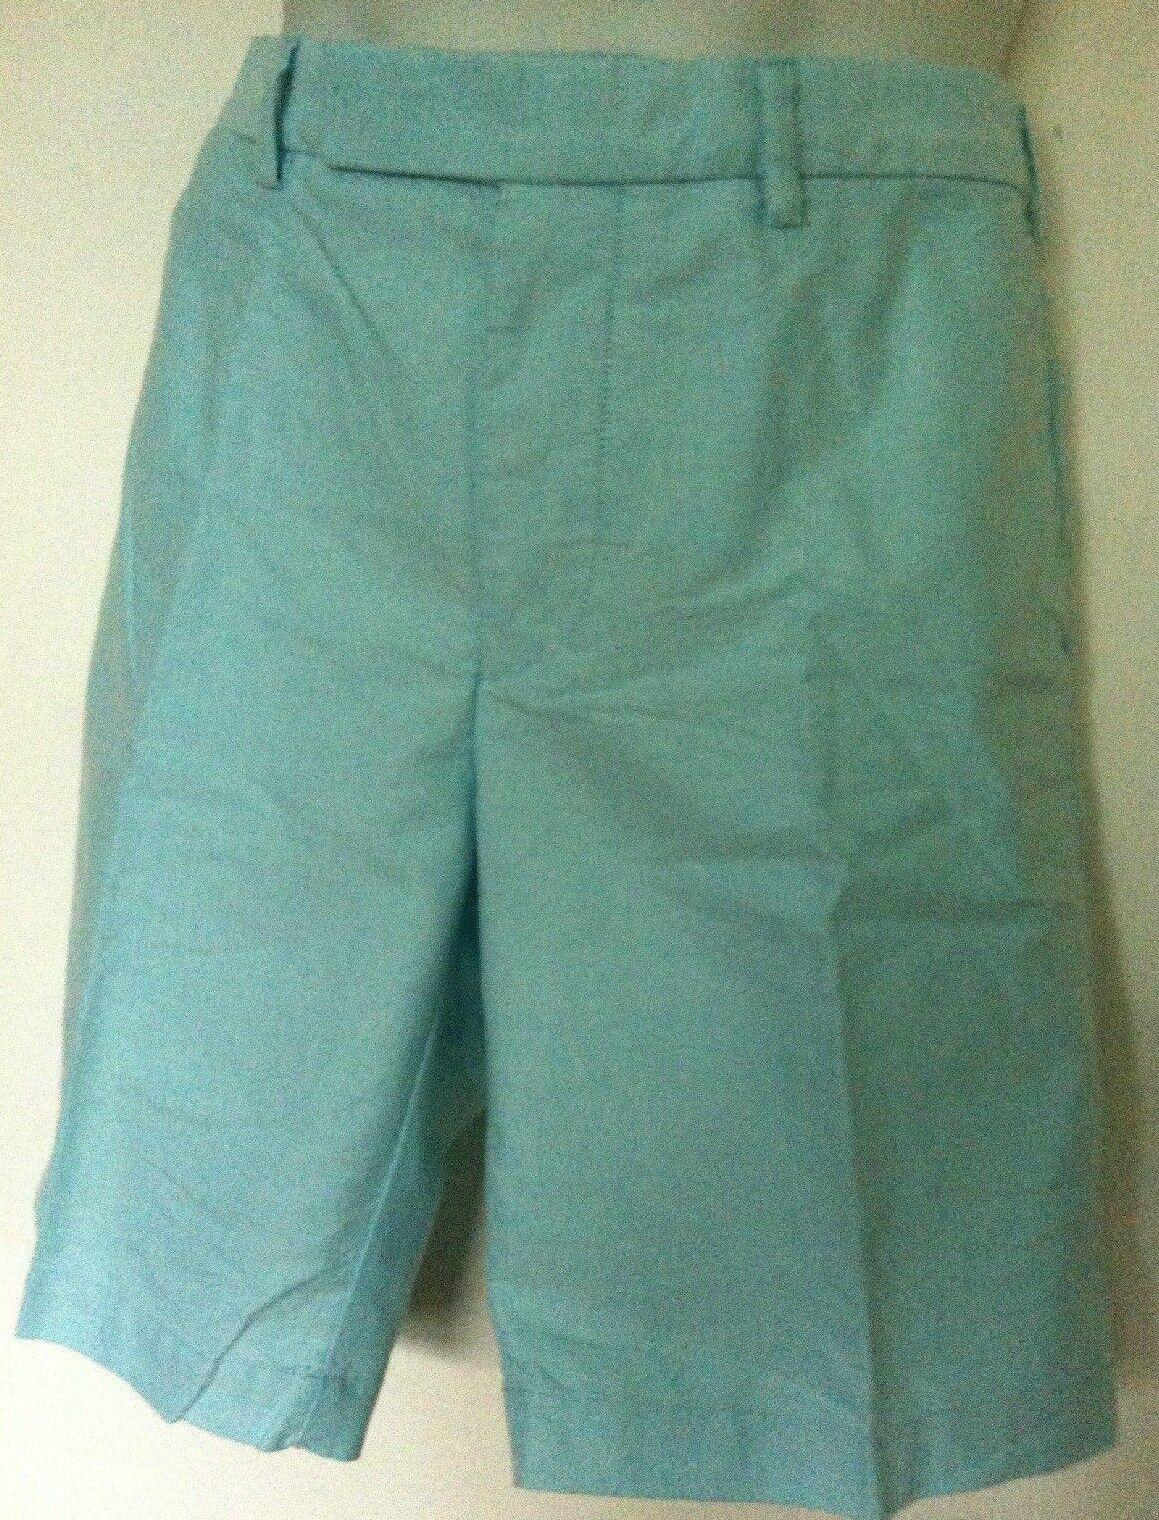 Polo Ralph Lauren Light Aqua bluee Oxford Shorts Flat Front Size 34 NWT